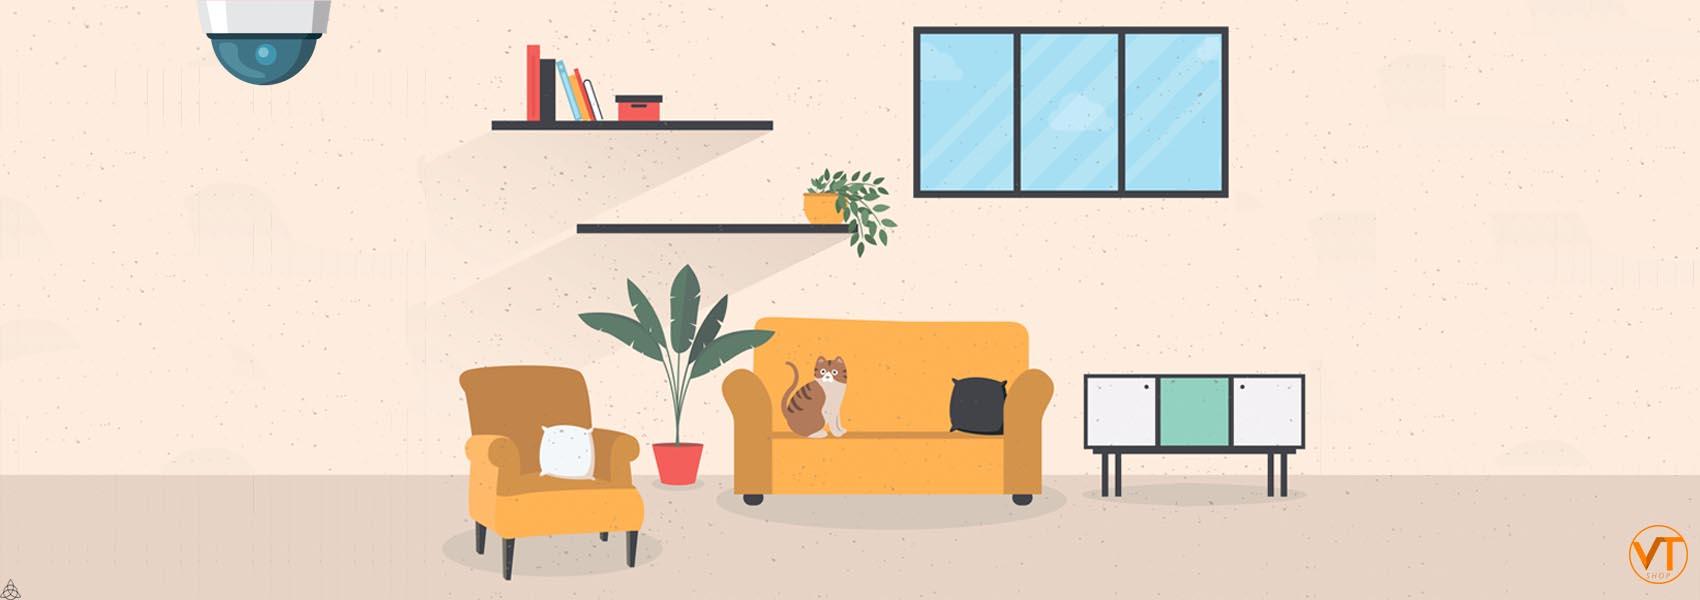 Монтаж видеонаблюдения в квартиру